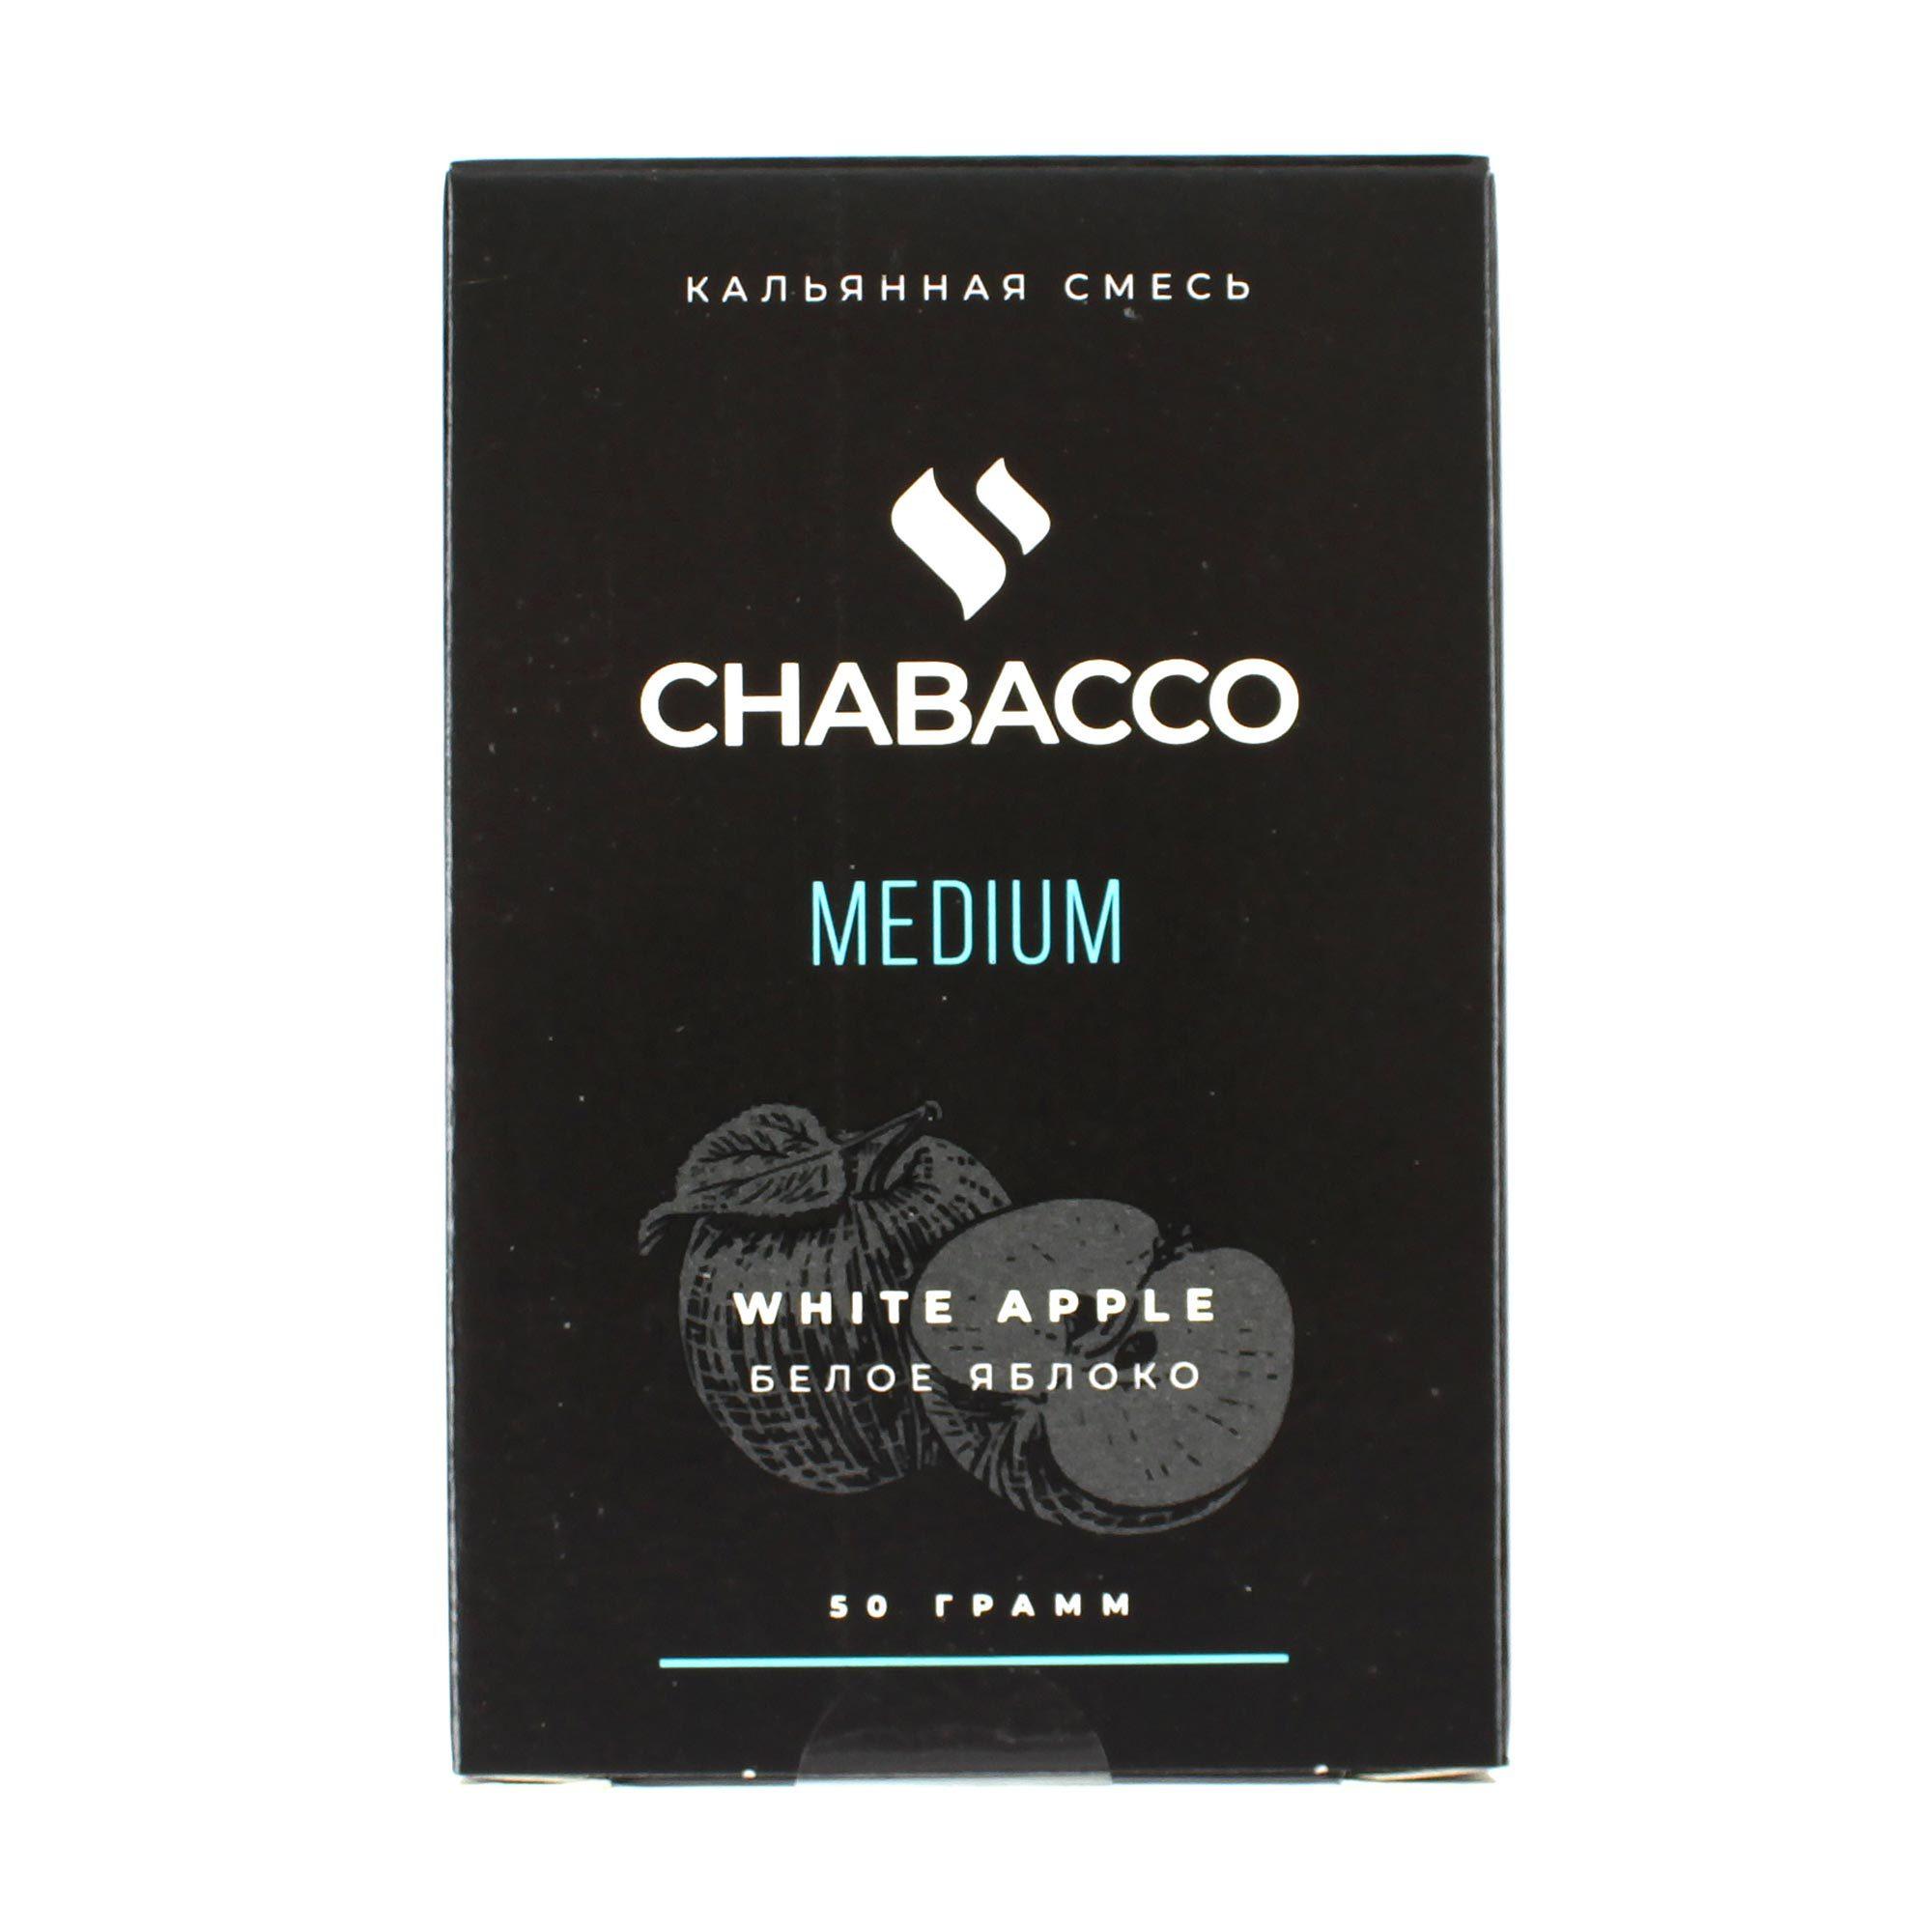 Кальянная смесь Chabacco Medium 50 гр White Apple